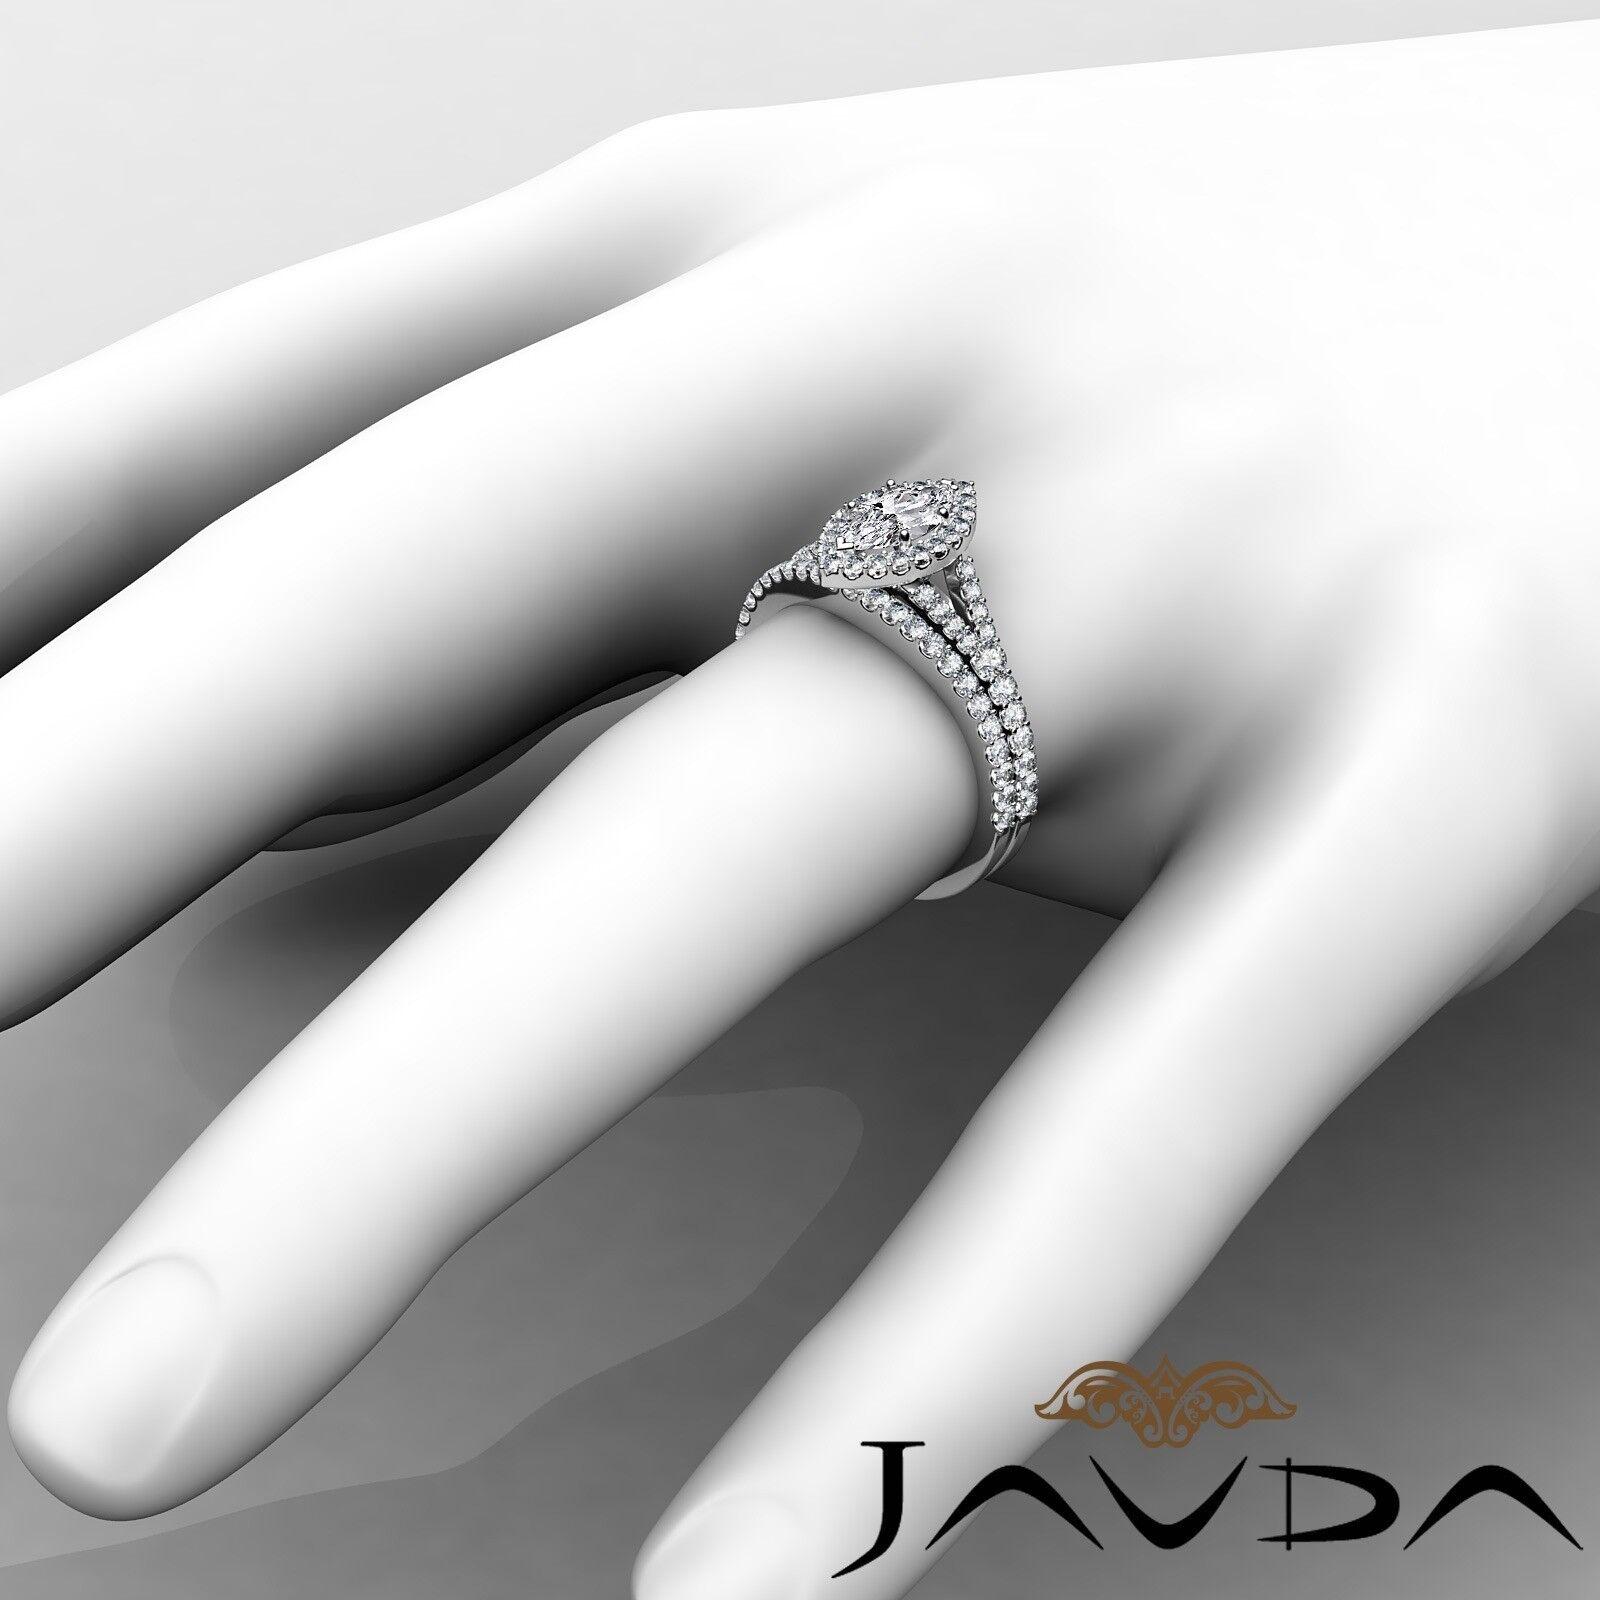 2.02ctw Halo Bridal Set Split Shank Marquise Diamond Engagement Ring GIA F-SI1 4